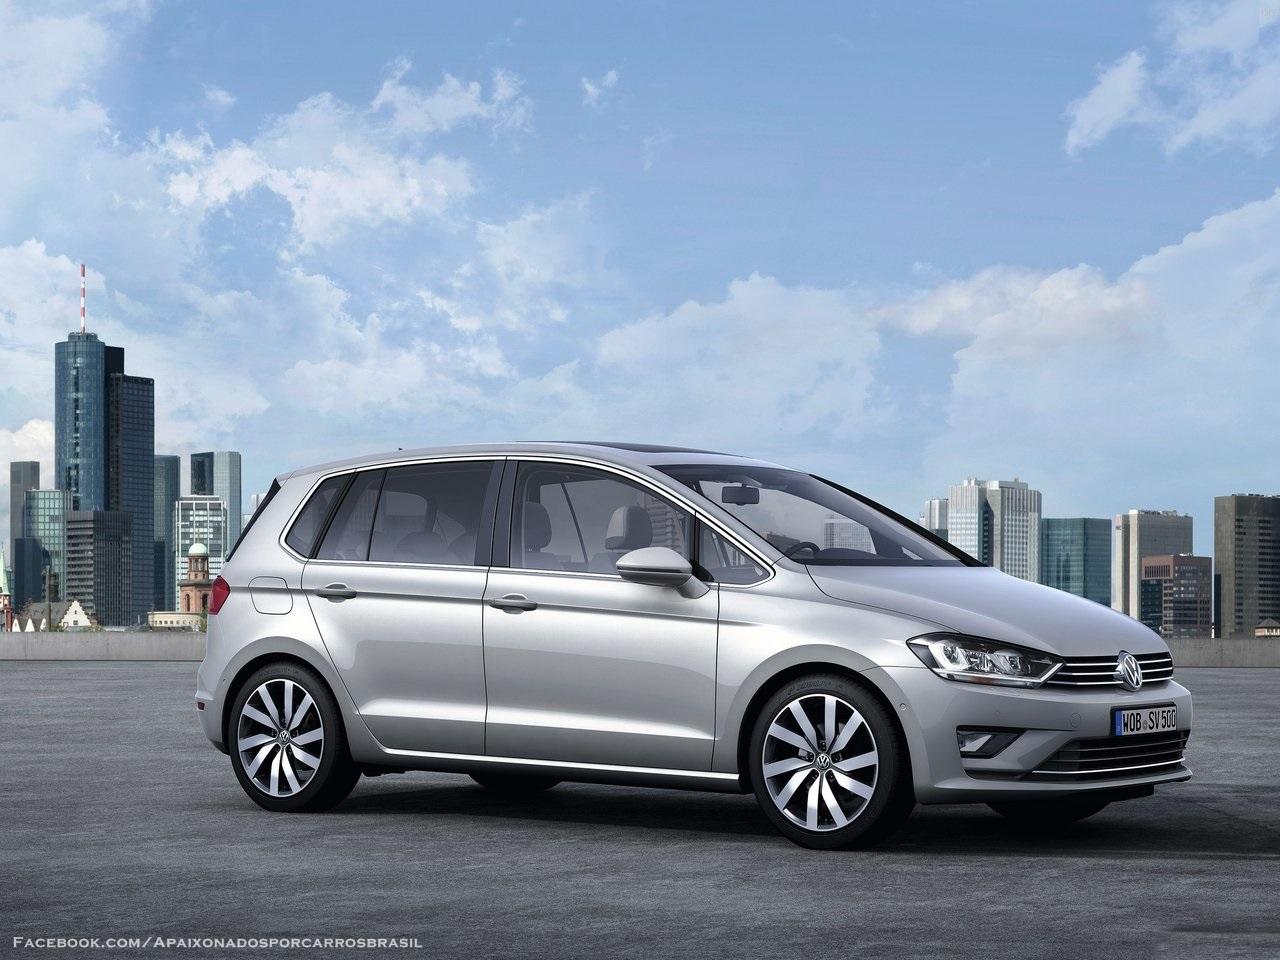 apaixonados por carros frankfurt golf sportsvan concept. Black Bedroom Furniture Sets. Home Design Ideas